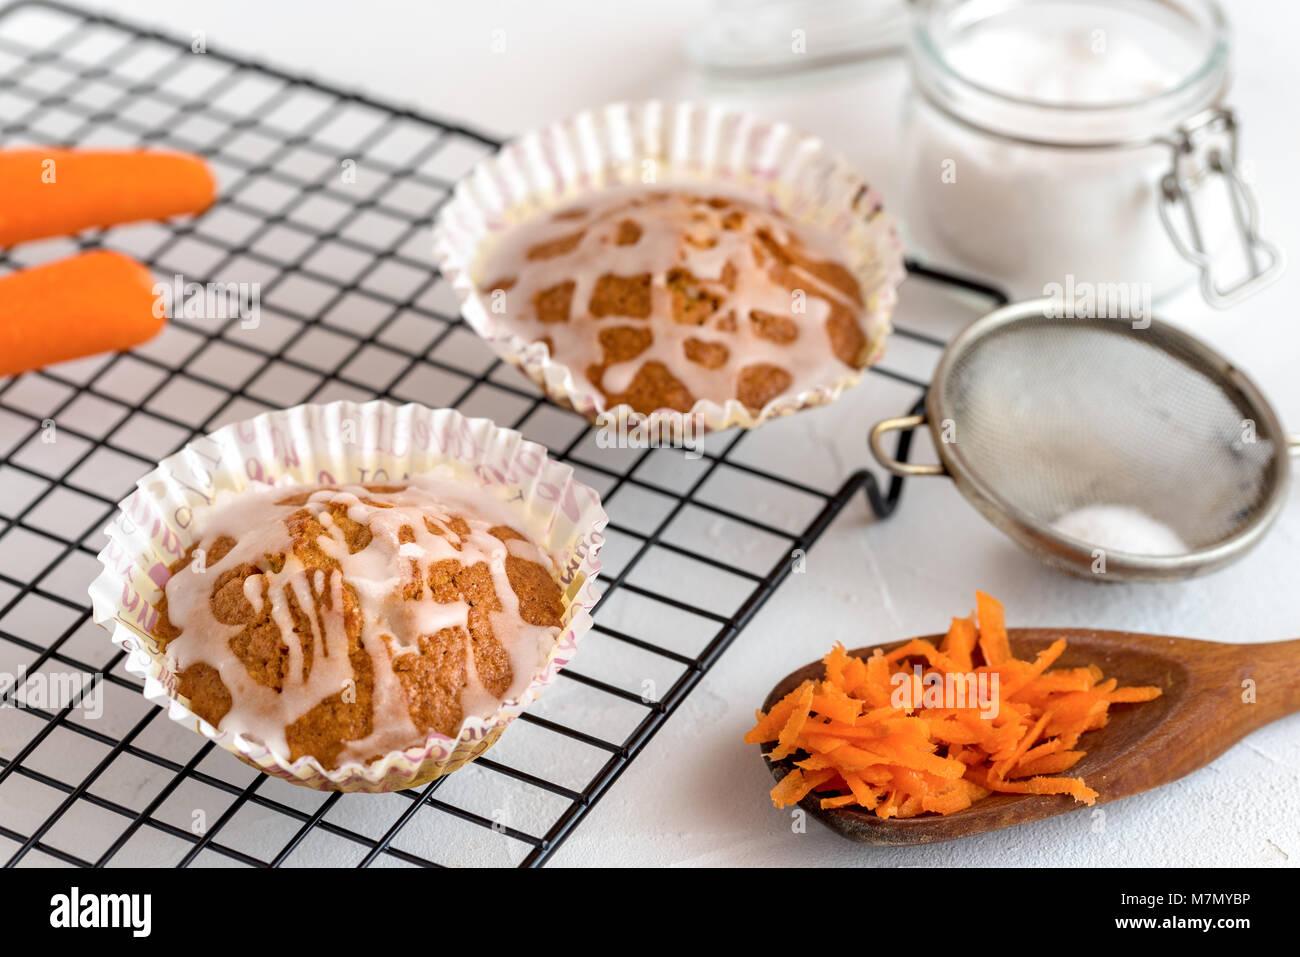 Homemade carrot cake cupcakes. - Stock Image